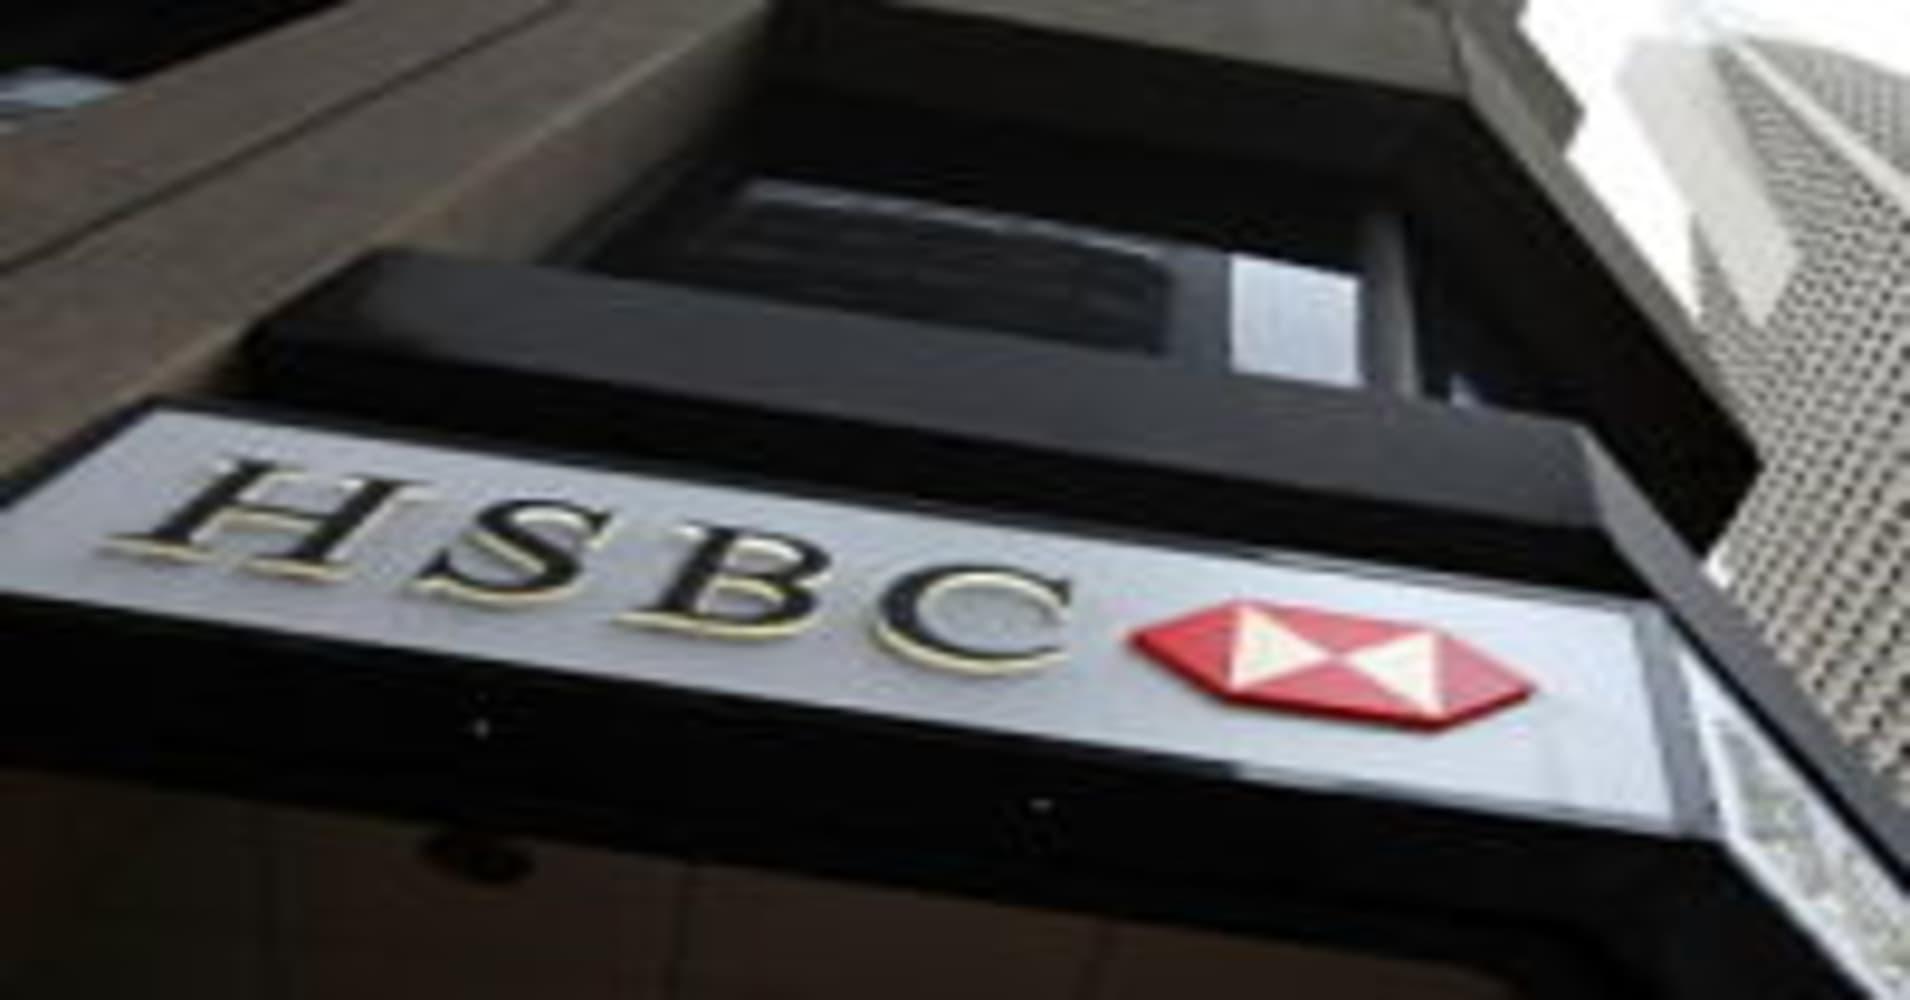 Hang Seng Bank a Better Bet Than Parent HSBC: Pro